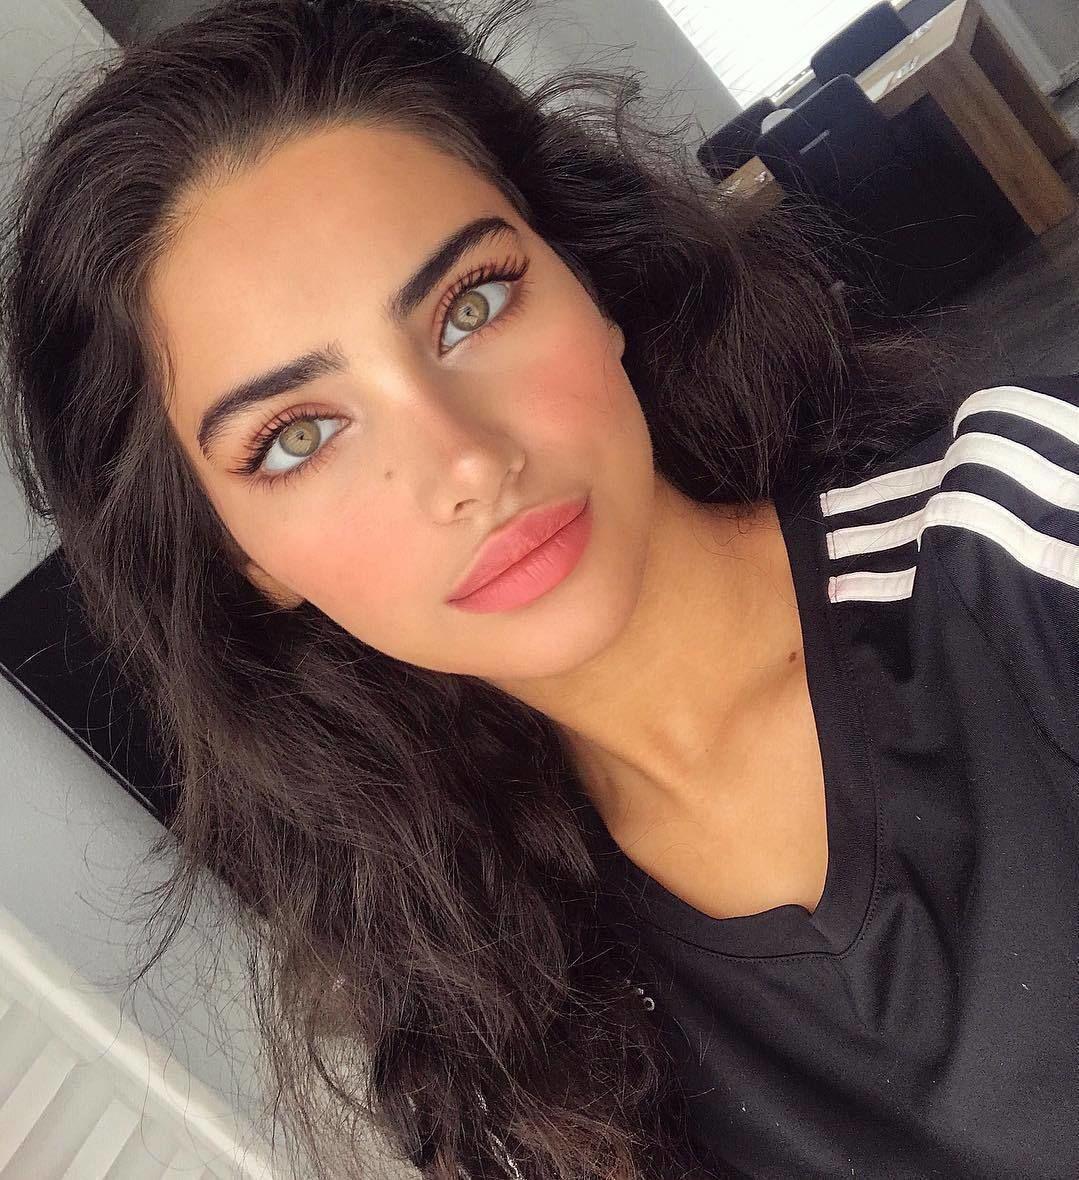 Beauty neginvaand womanslook beautiful Прически и